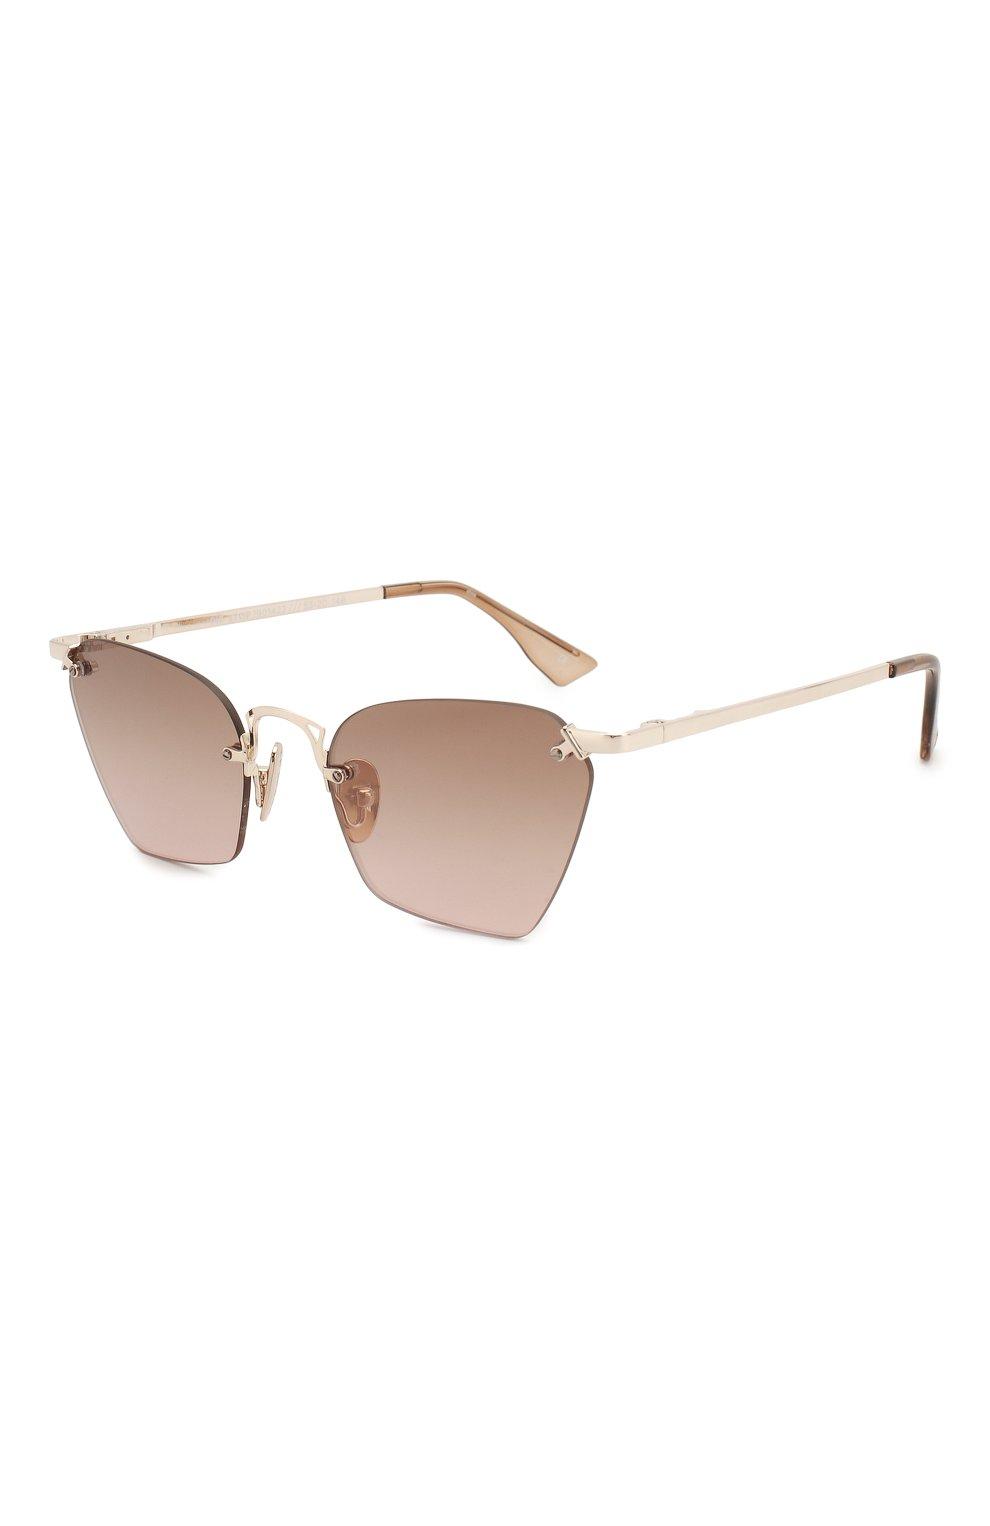 Женские солнцезащитные очки LE SPECS LUXE коричневого цвета, арт. PIT ST0P/1901423 | Фото 1